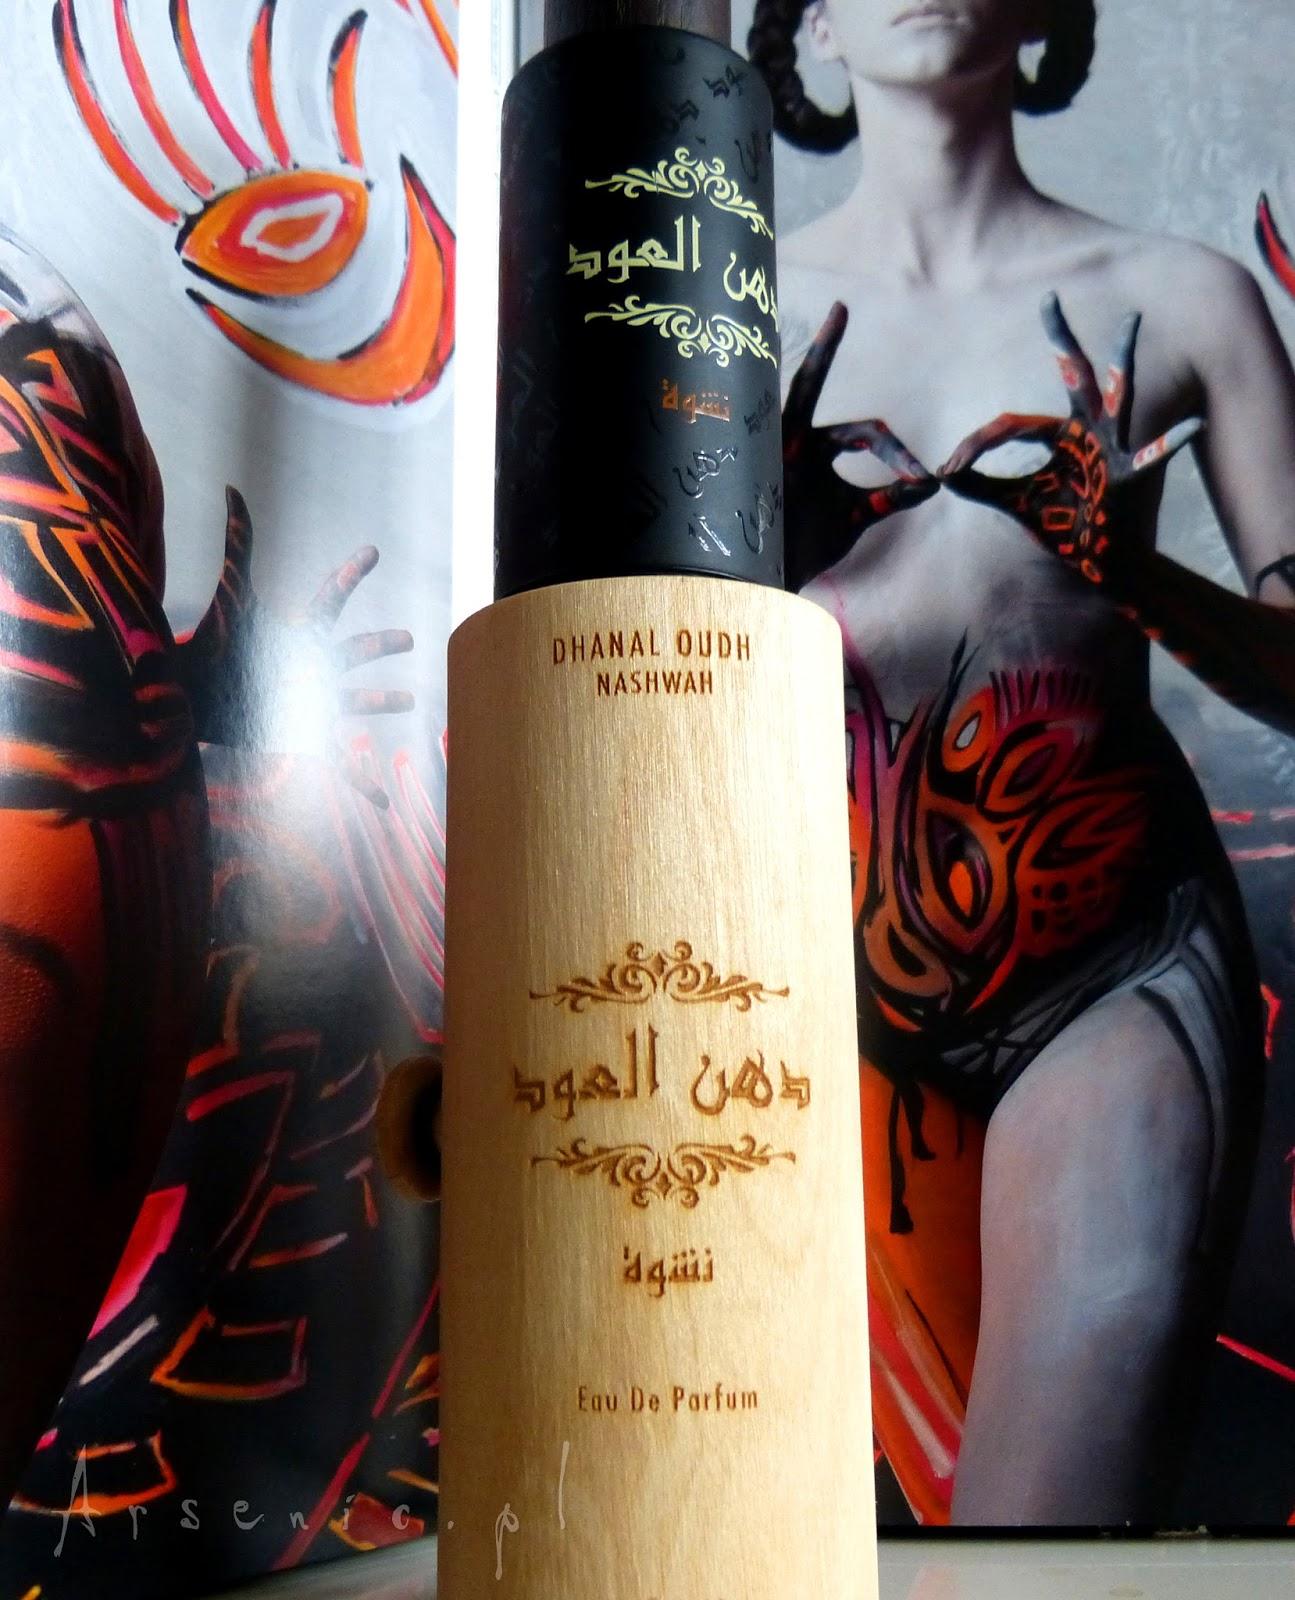 Grupy facebookowe o perfumach to zło: Rasasi Dhanal Oudh Nashwah